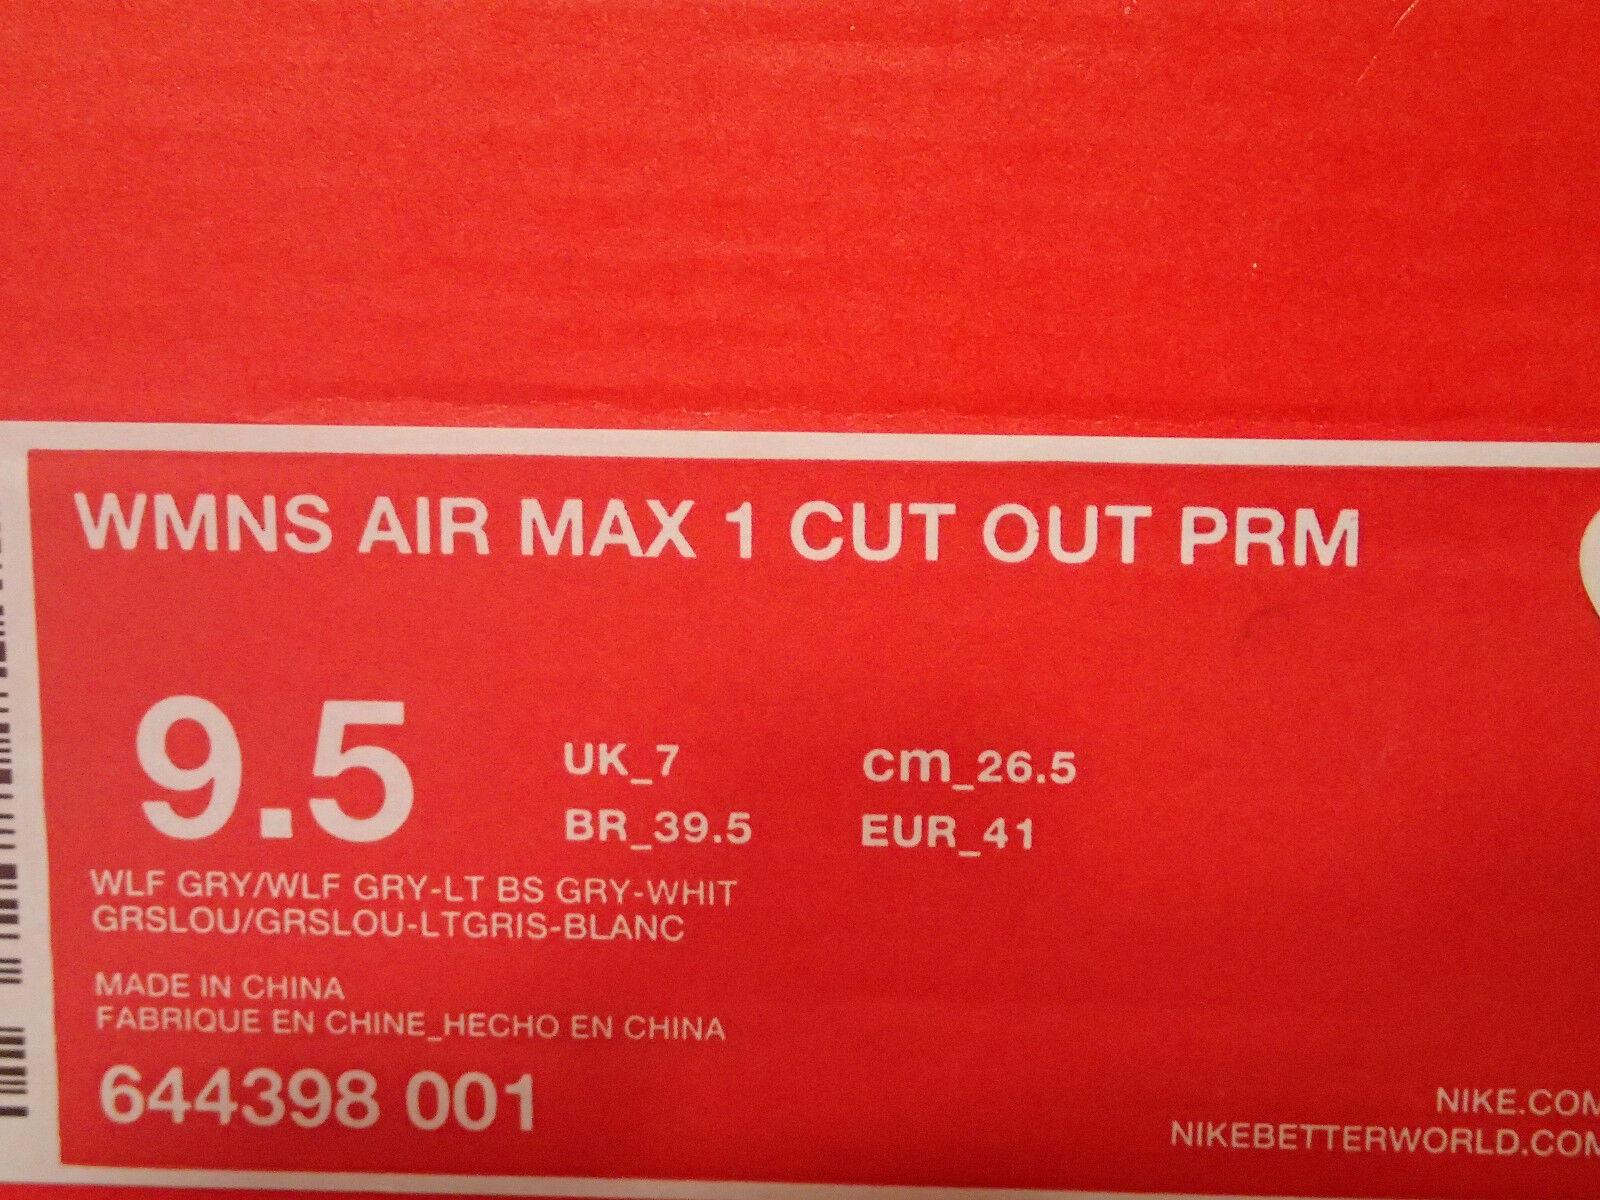 Donna Nike Air Grigio Max 1 Cut Out Premium Grigio Air Lupo Bianco Taglie 9.5 (644398-001) 075bd8